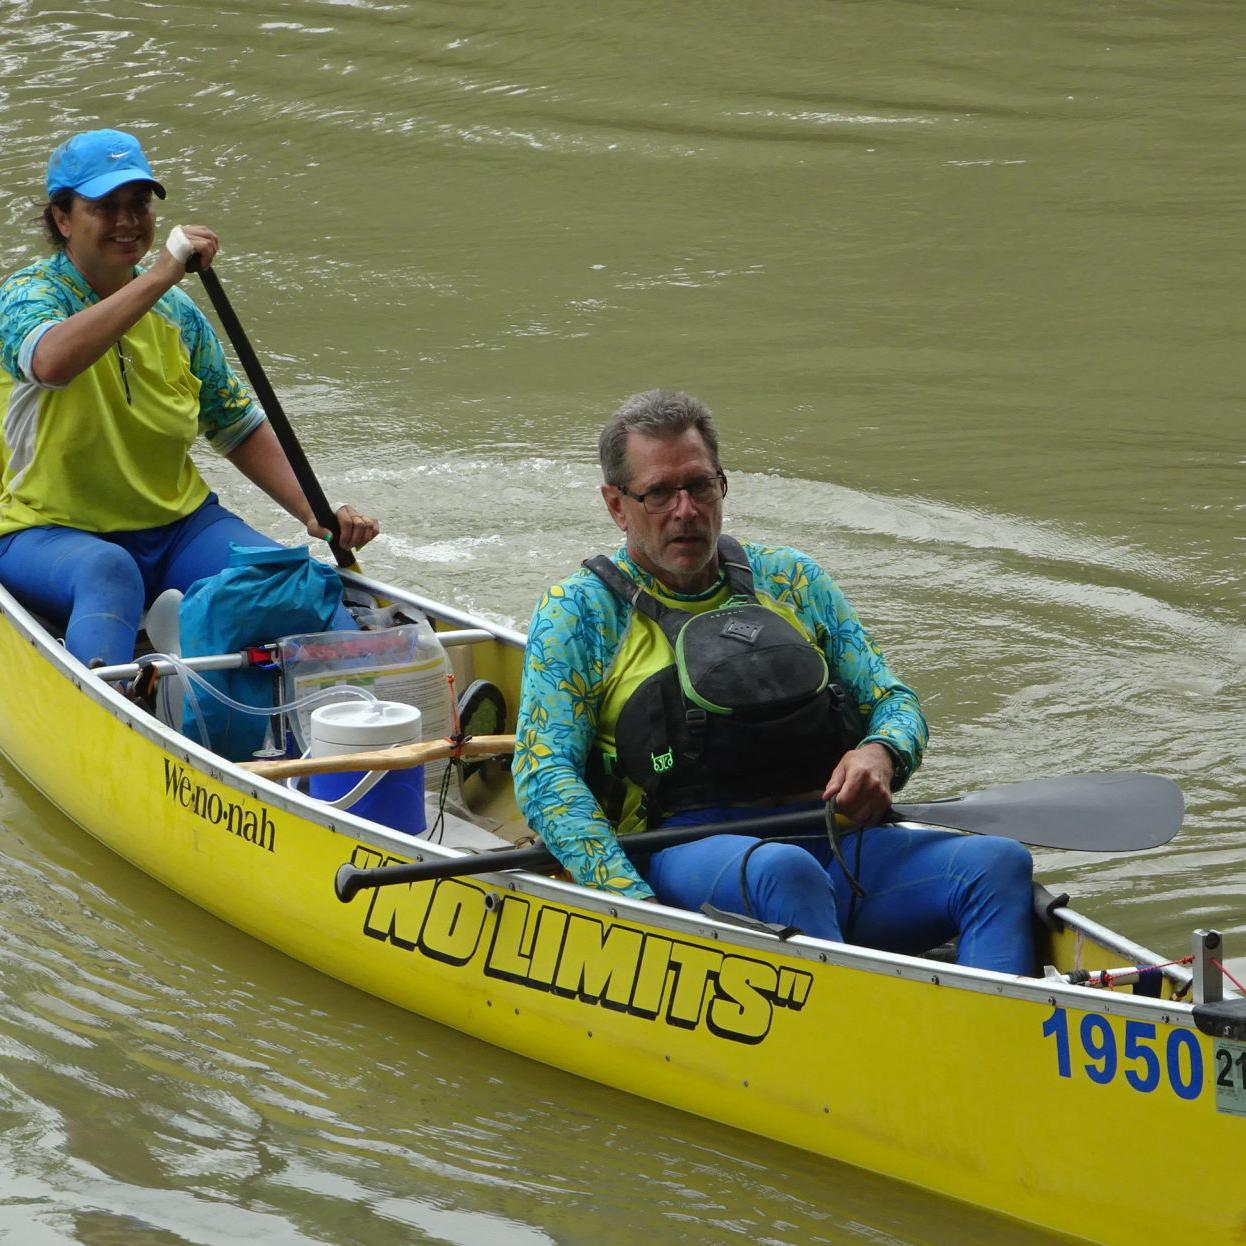 Winona man finishes 'toughest canoe race in the world